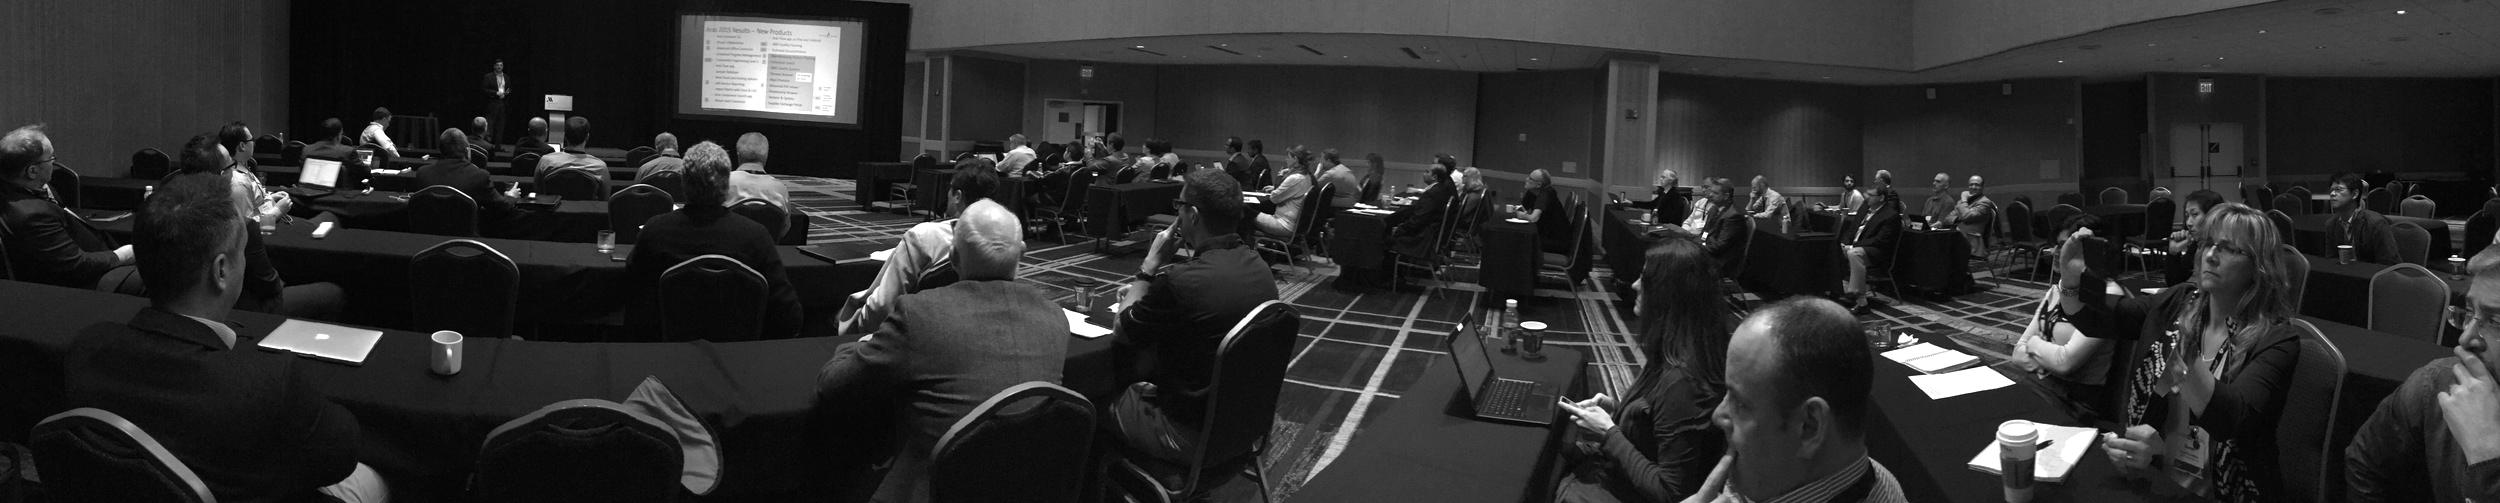 Pre-Conference Partner Session